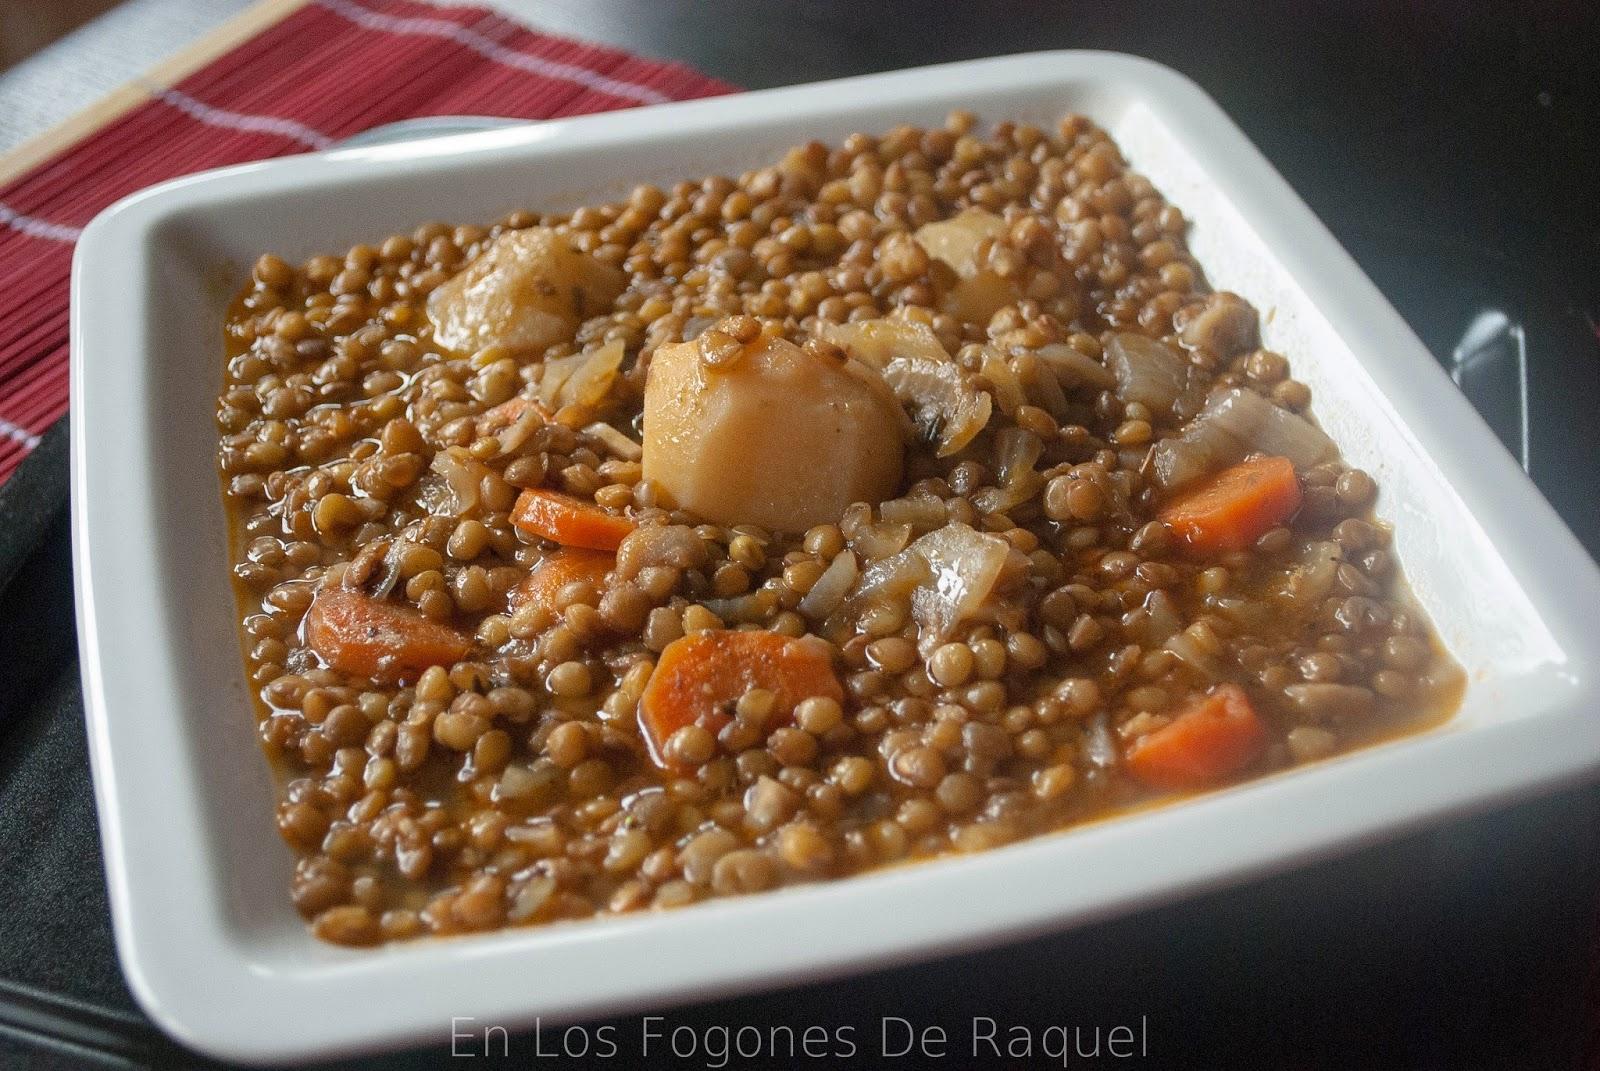 http://enlosfogonesderaquel.blogspot.com.es/2015/03/lentejas-estofadas-al-tomillo-con.html